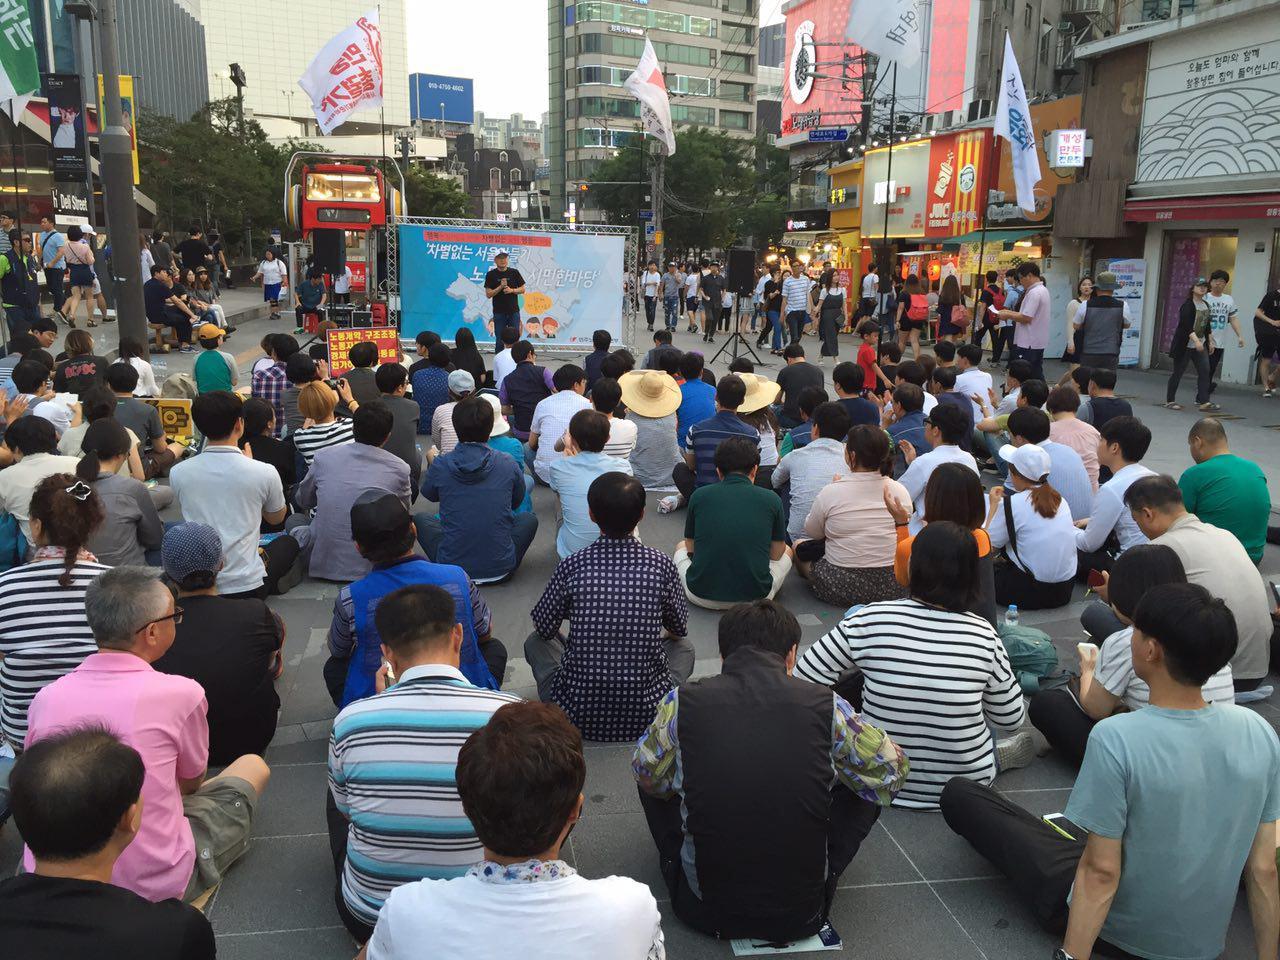 photo_2016-06-20_10-32-57.jpg